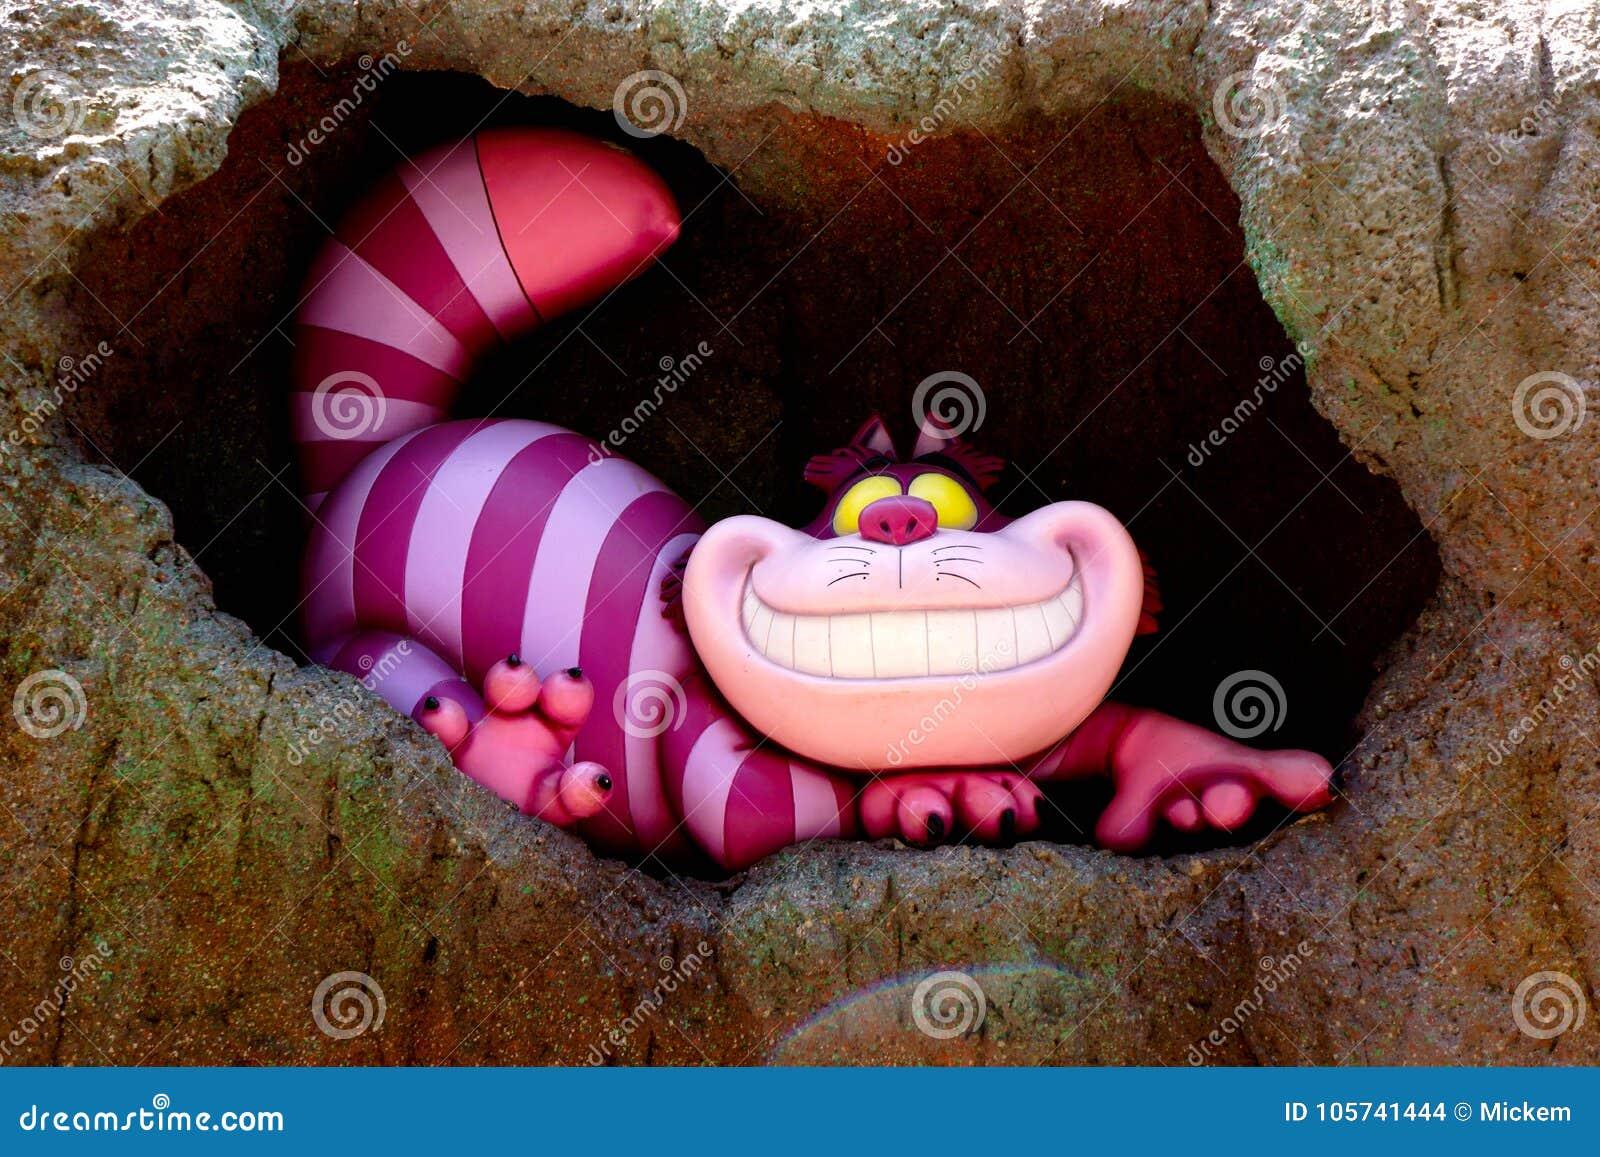 Disney Cheshire Cat Grinning